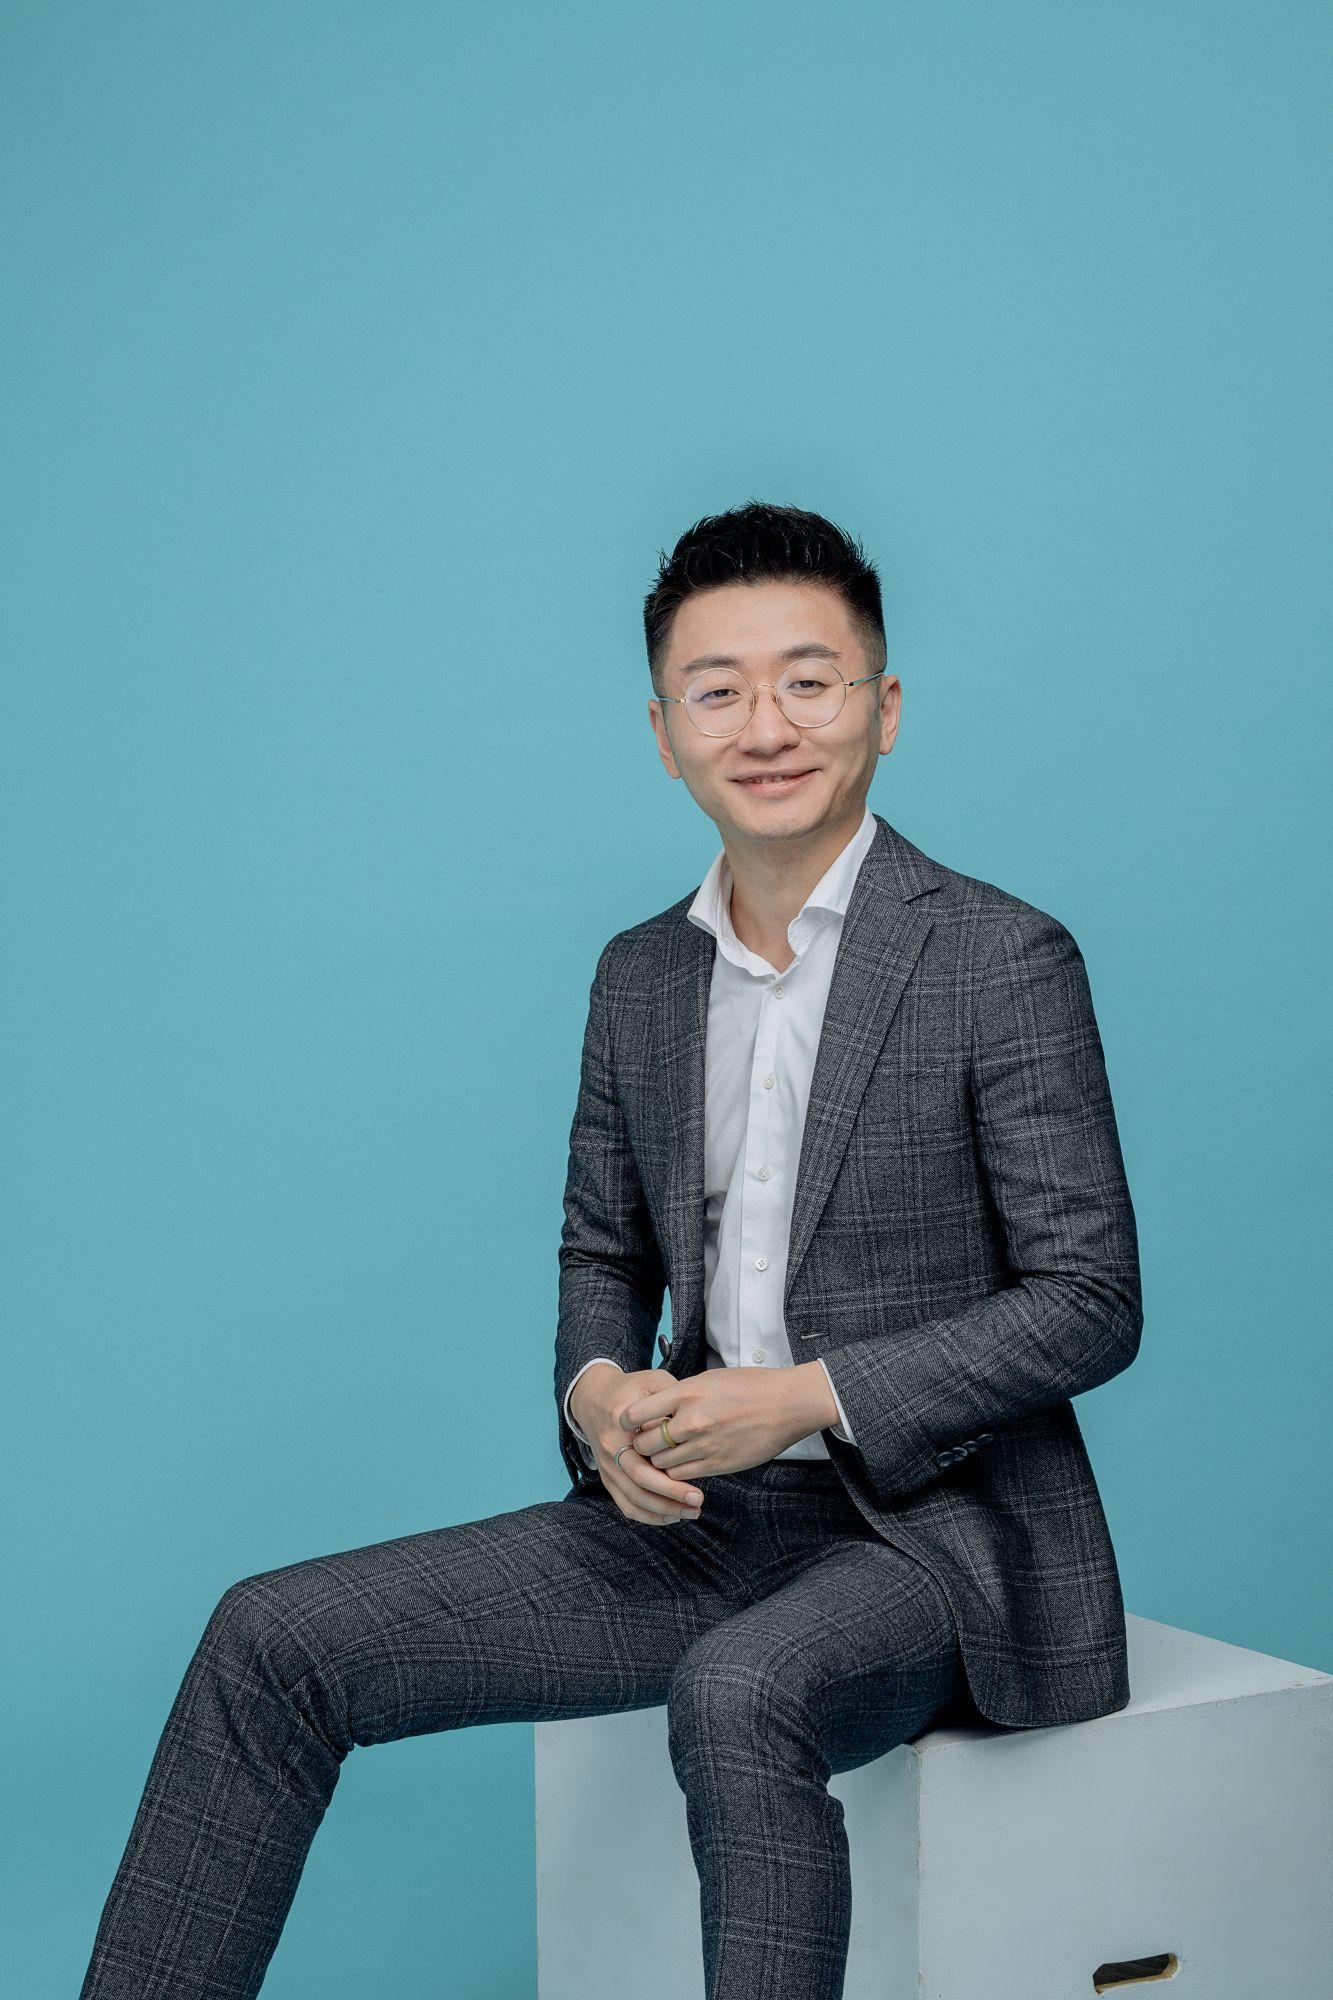 Jayden Xue Junteng